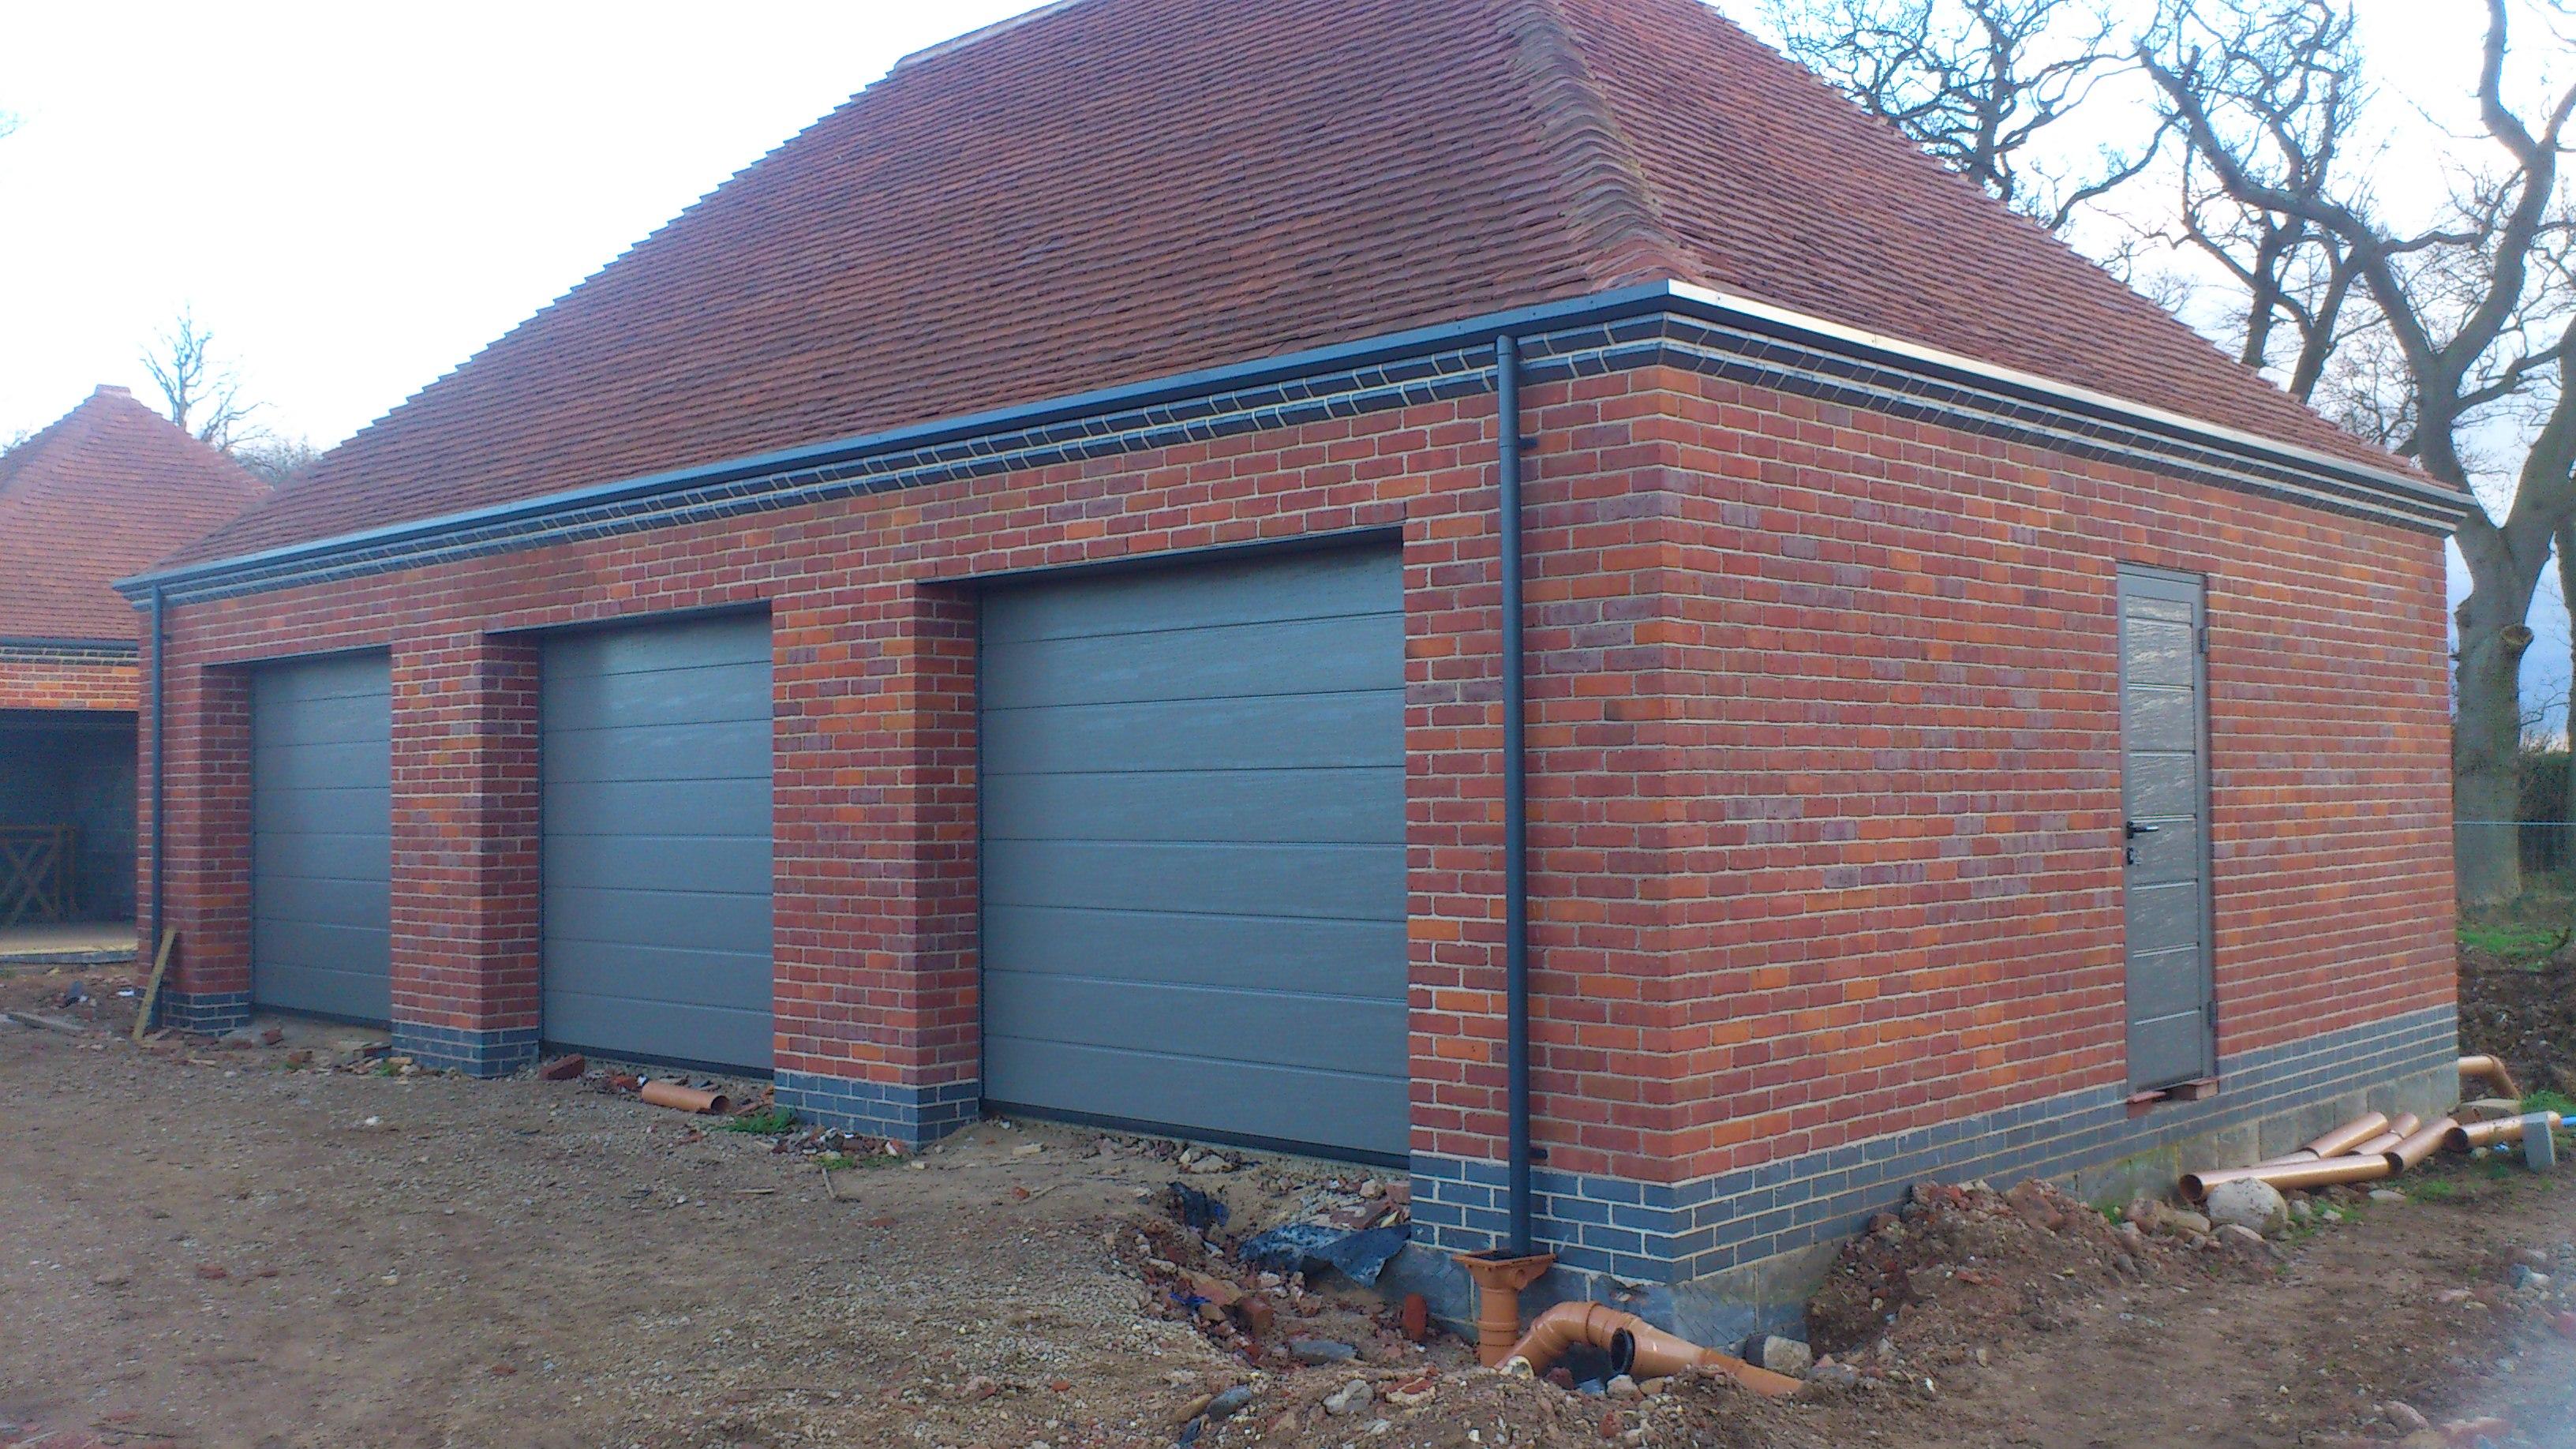 3 x Hormann LPU M Ribbed sectional garage doors \u0026 SupraMatic automatioc with matching side doors fitted in Peterborough. « & Hormann Sectional Garage Doors fitted in Peterborough | Fenland ... Pezcame.Com